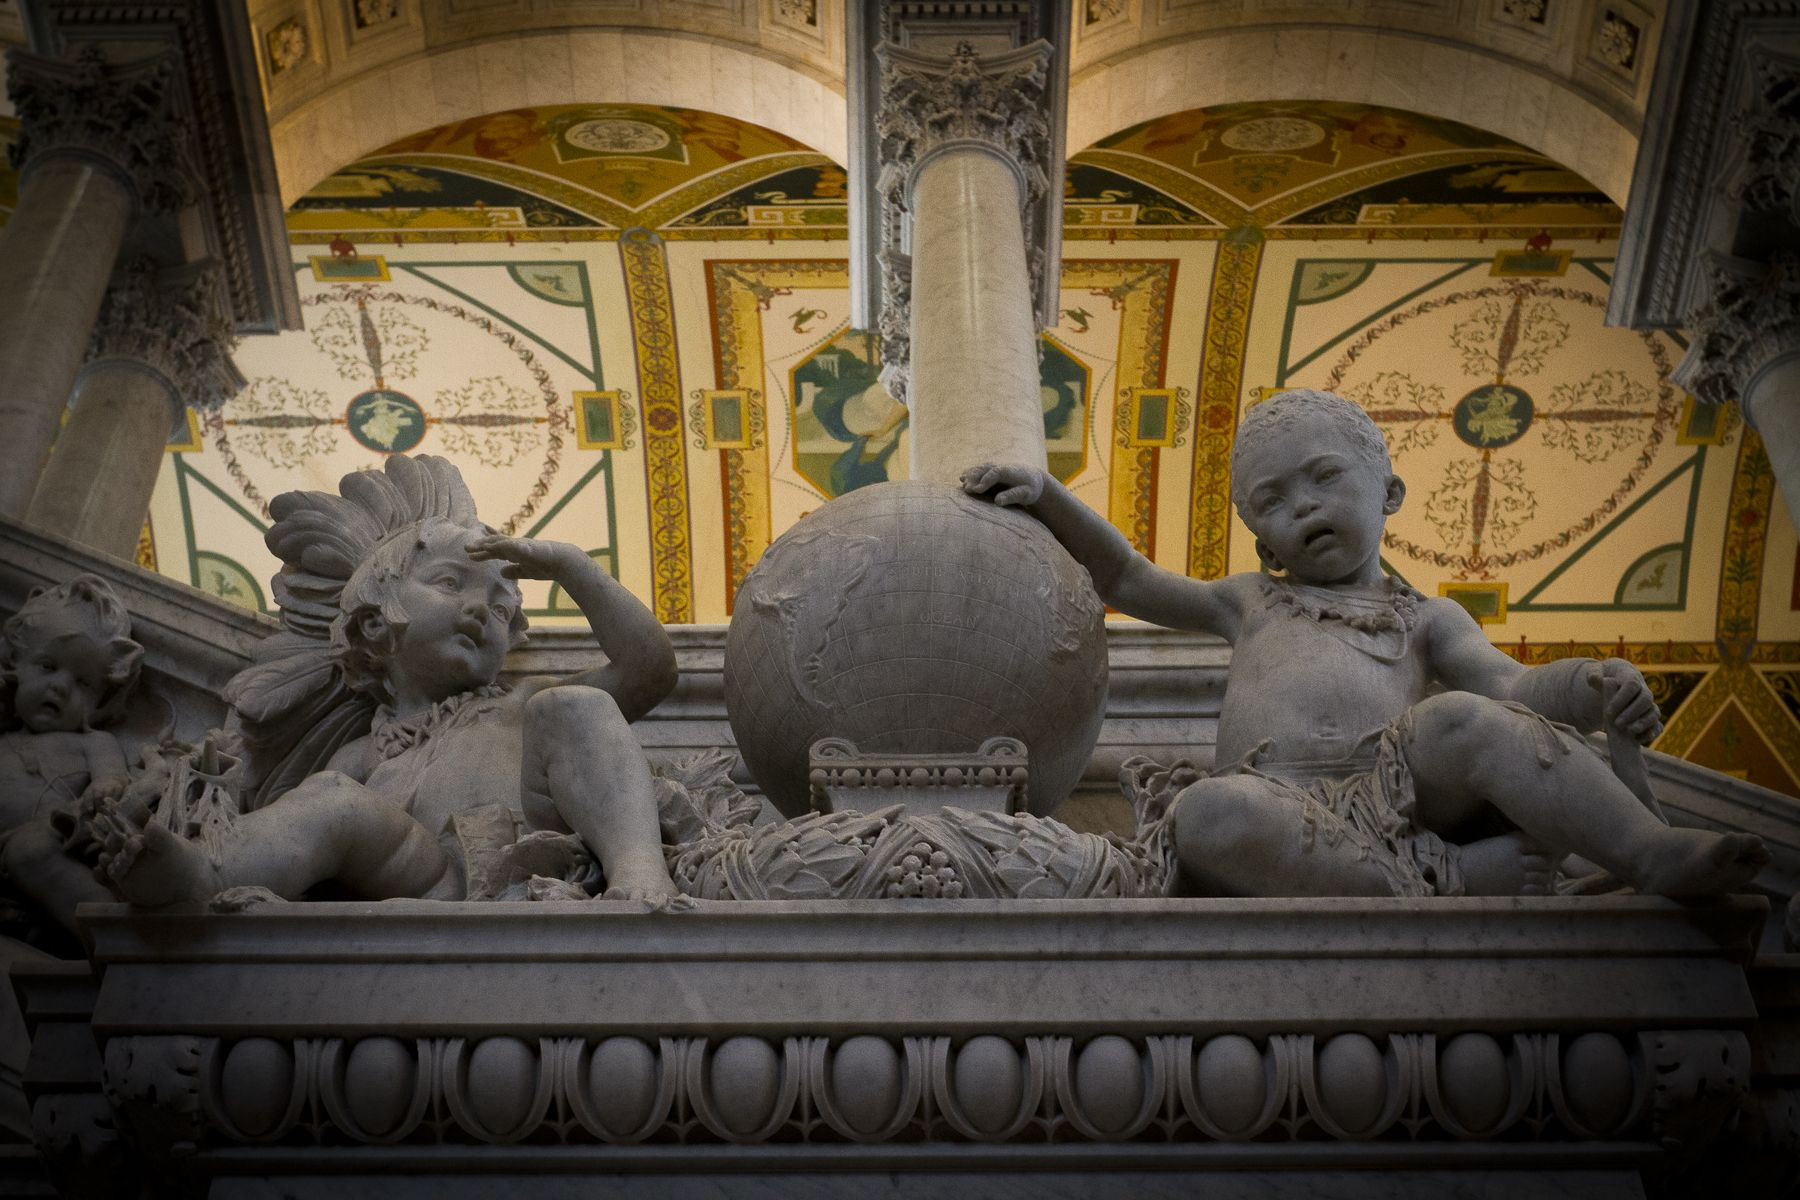 Capitol Lion sculpture, Statue, Buddha